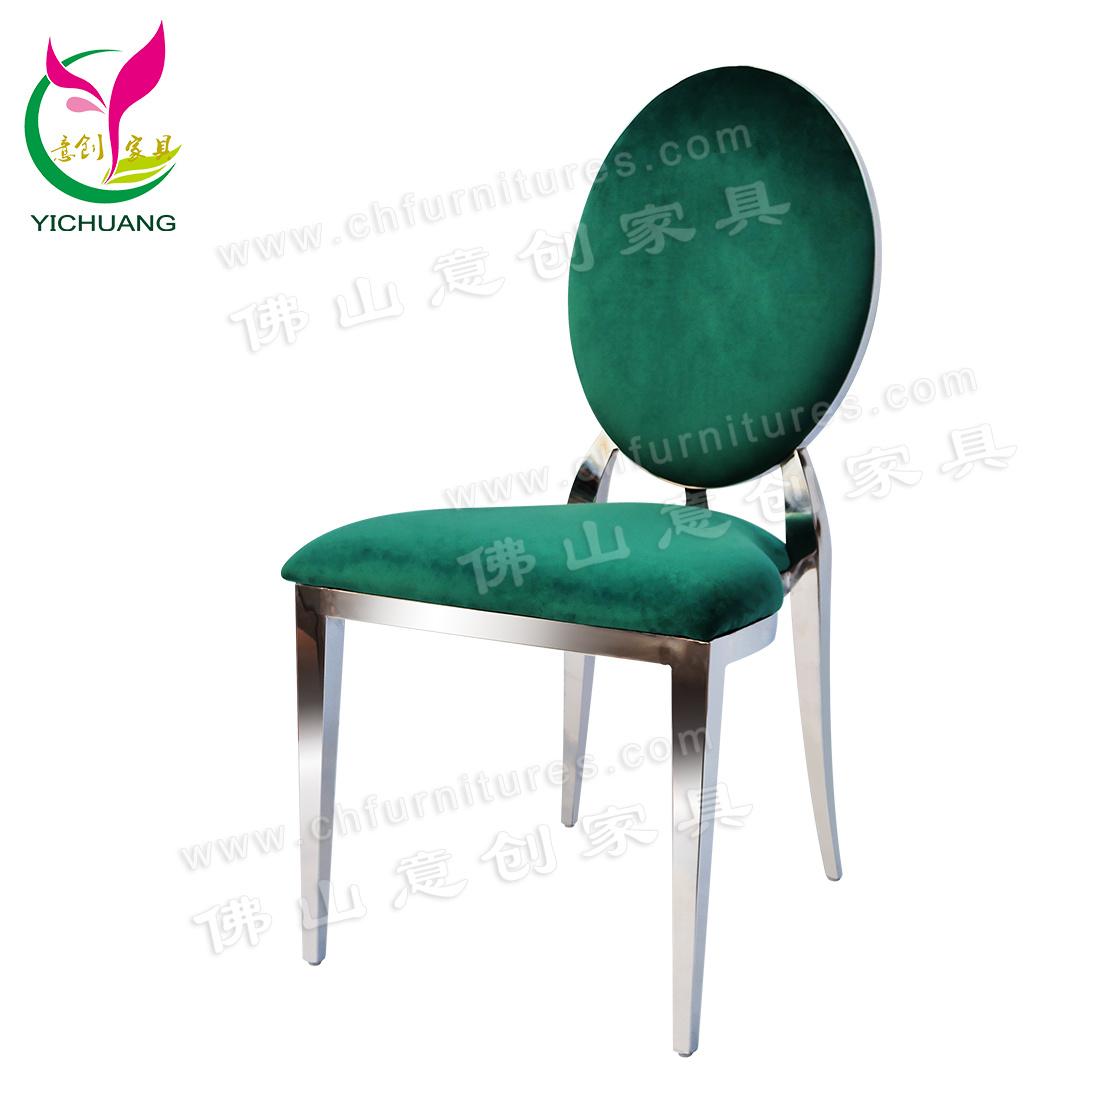 Ycx Ss26 04 Modern Green Velvet Fabric